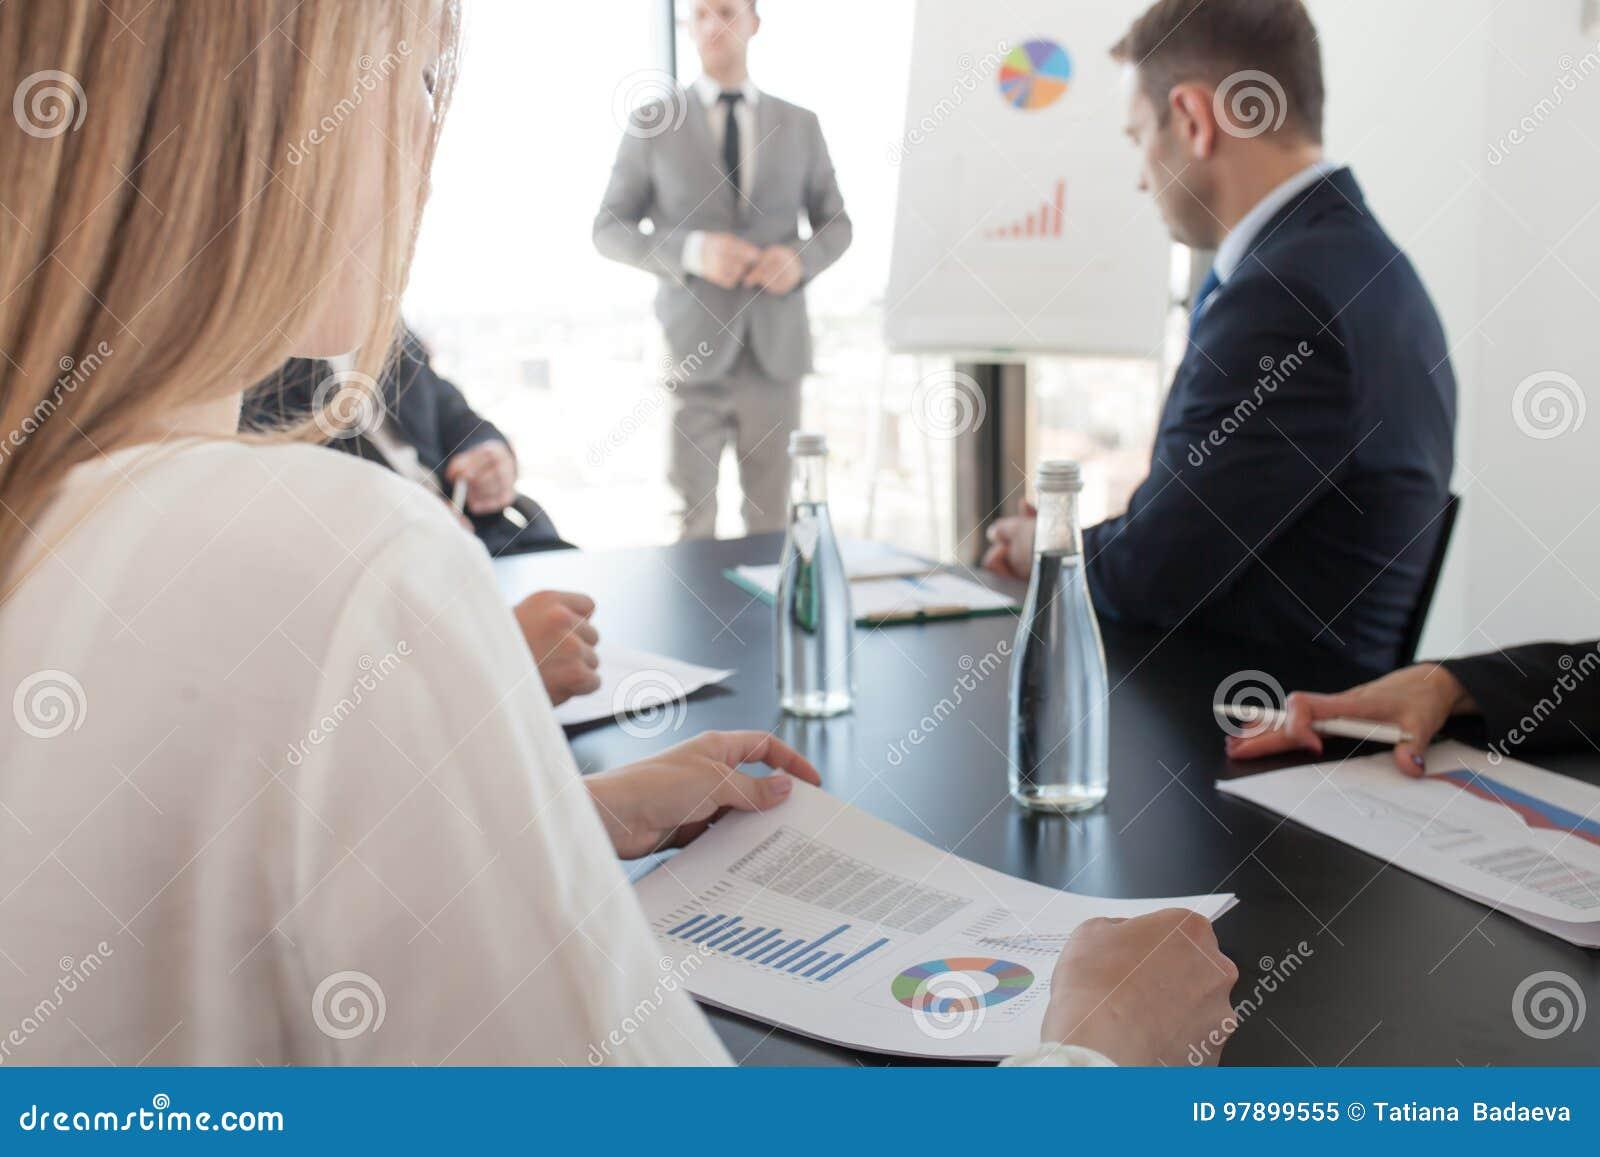 Presentation Of Diagrams At Flip Chart Stock Image